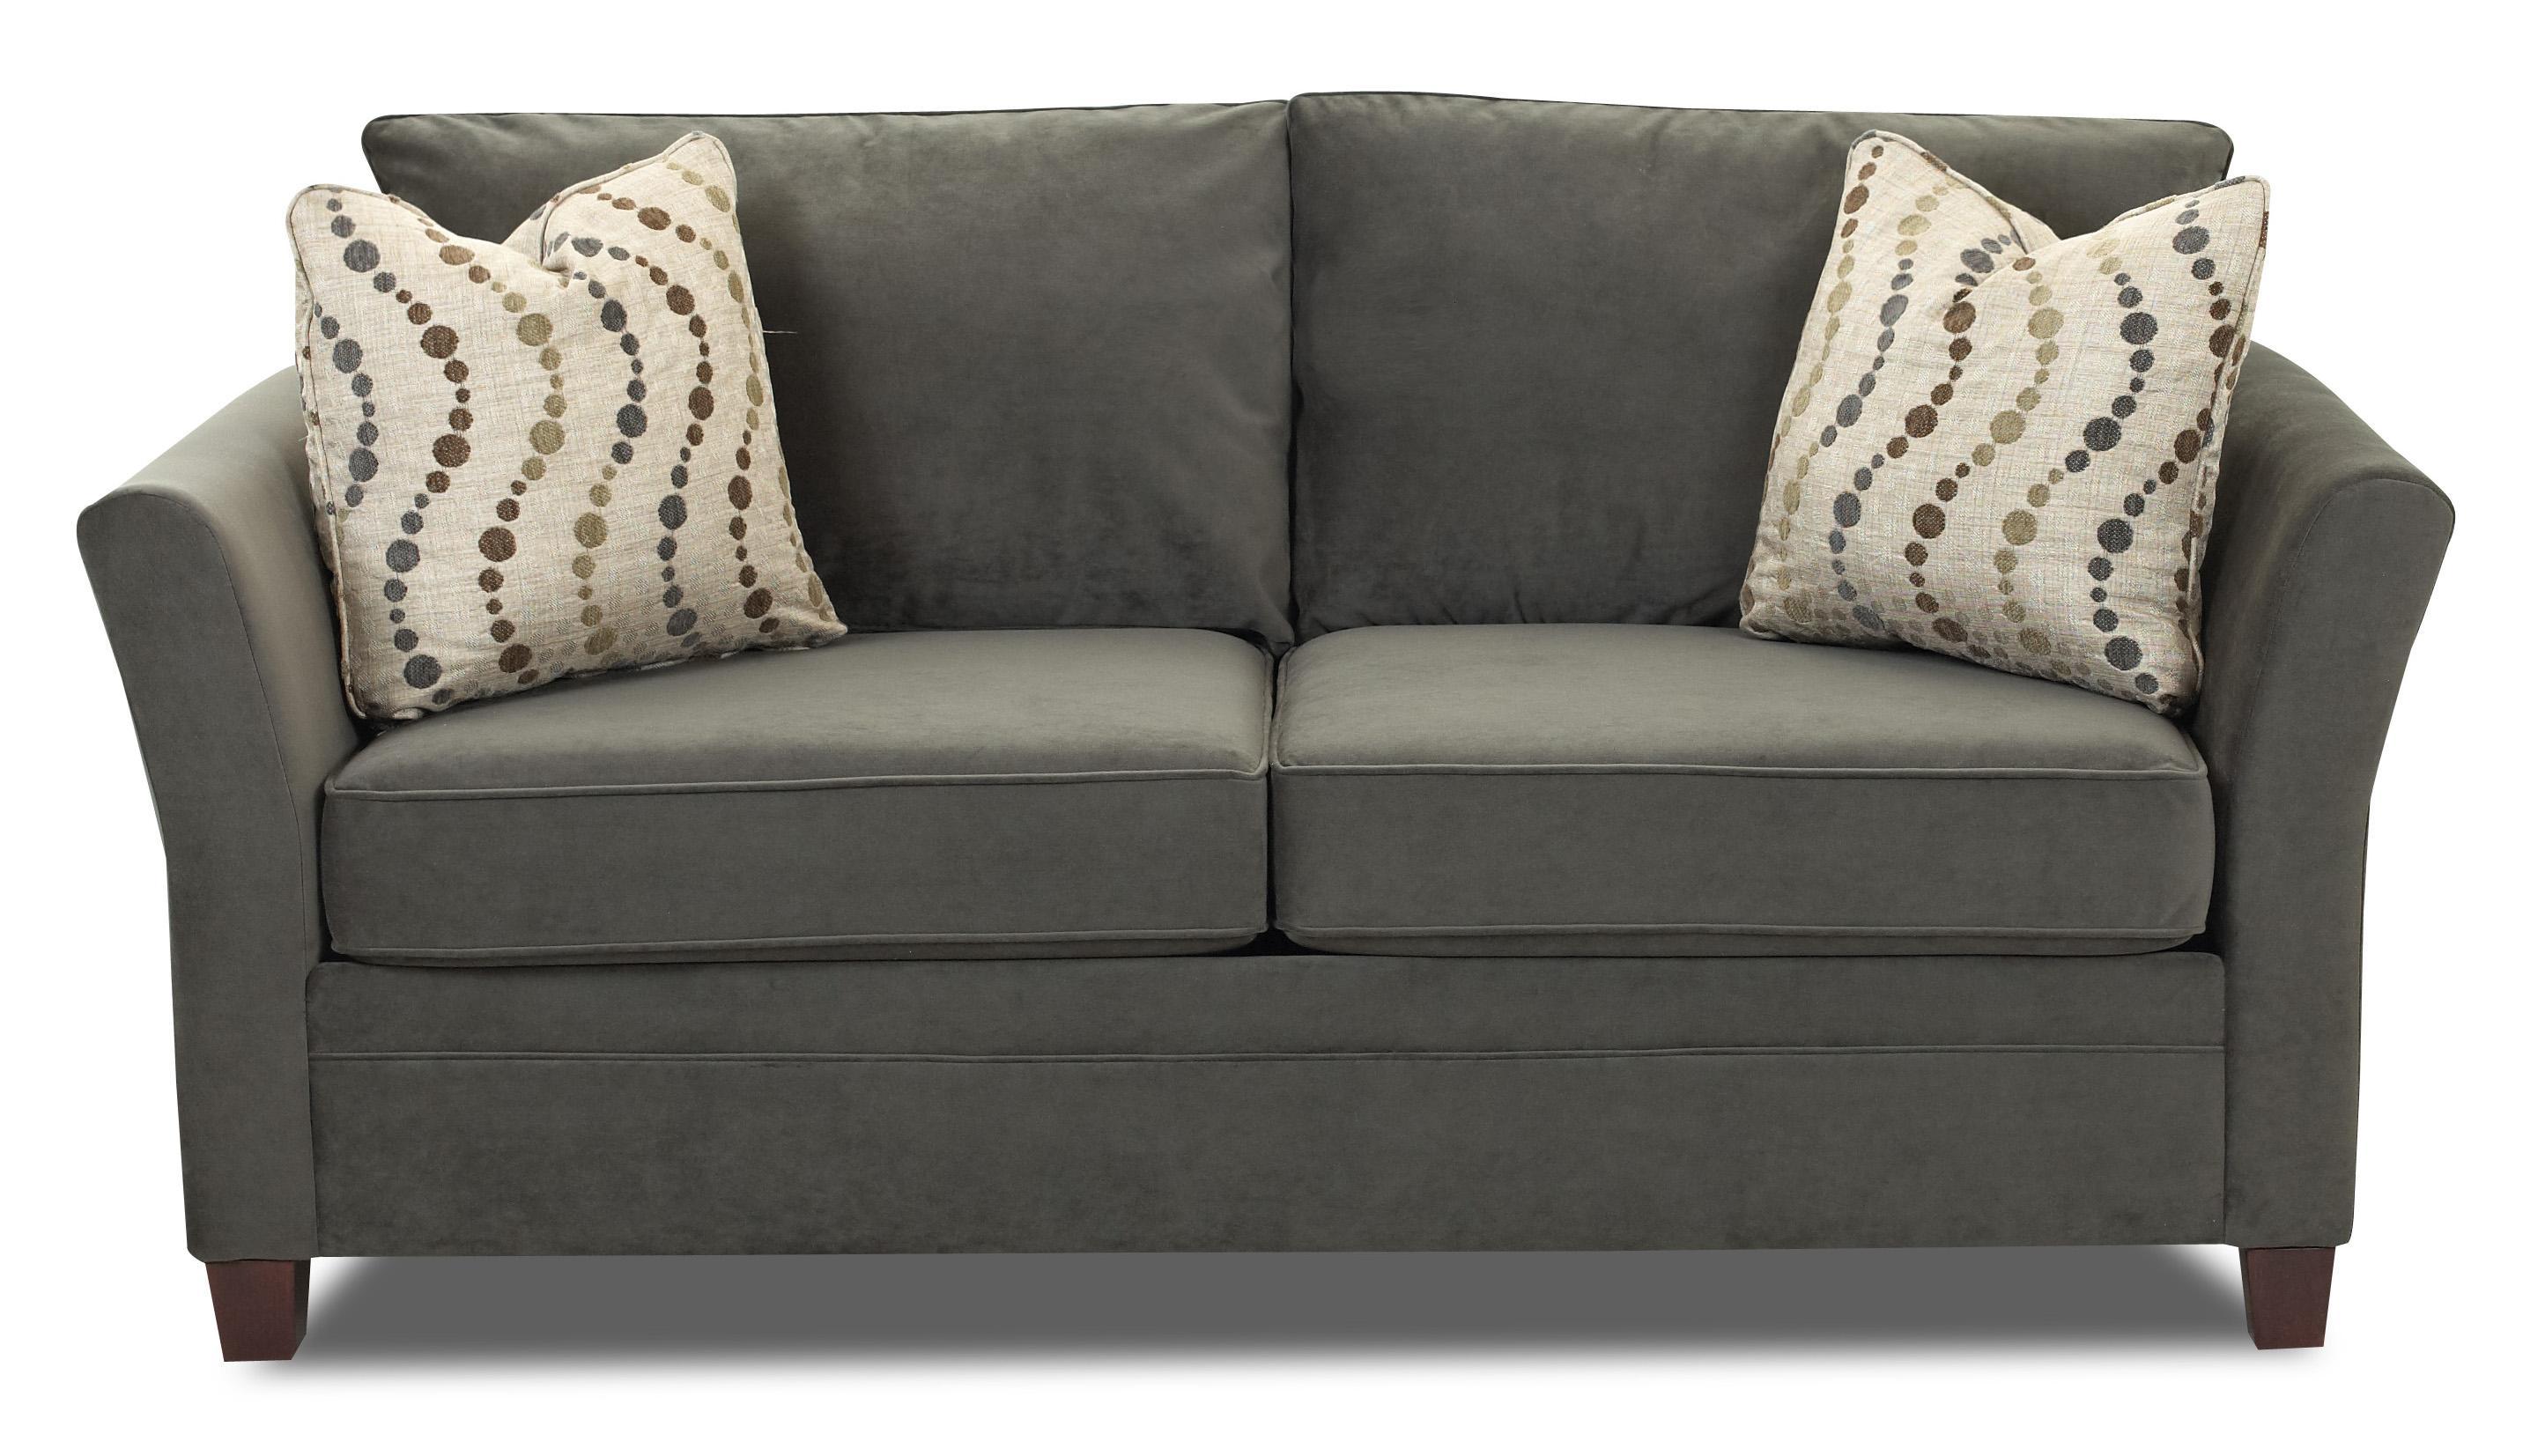 High Quality Klaussner Taylor Studio Sofa ...